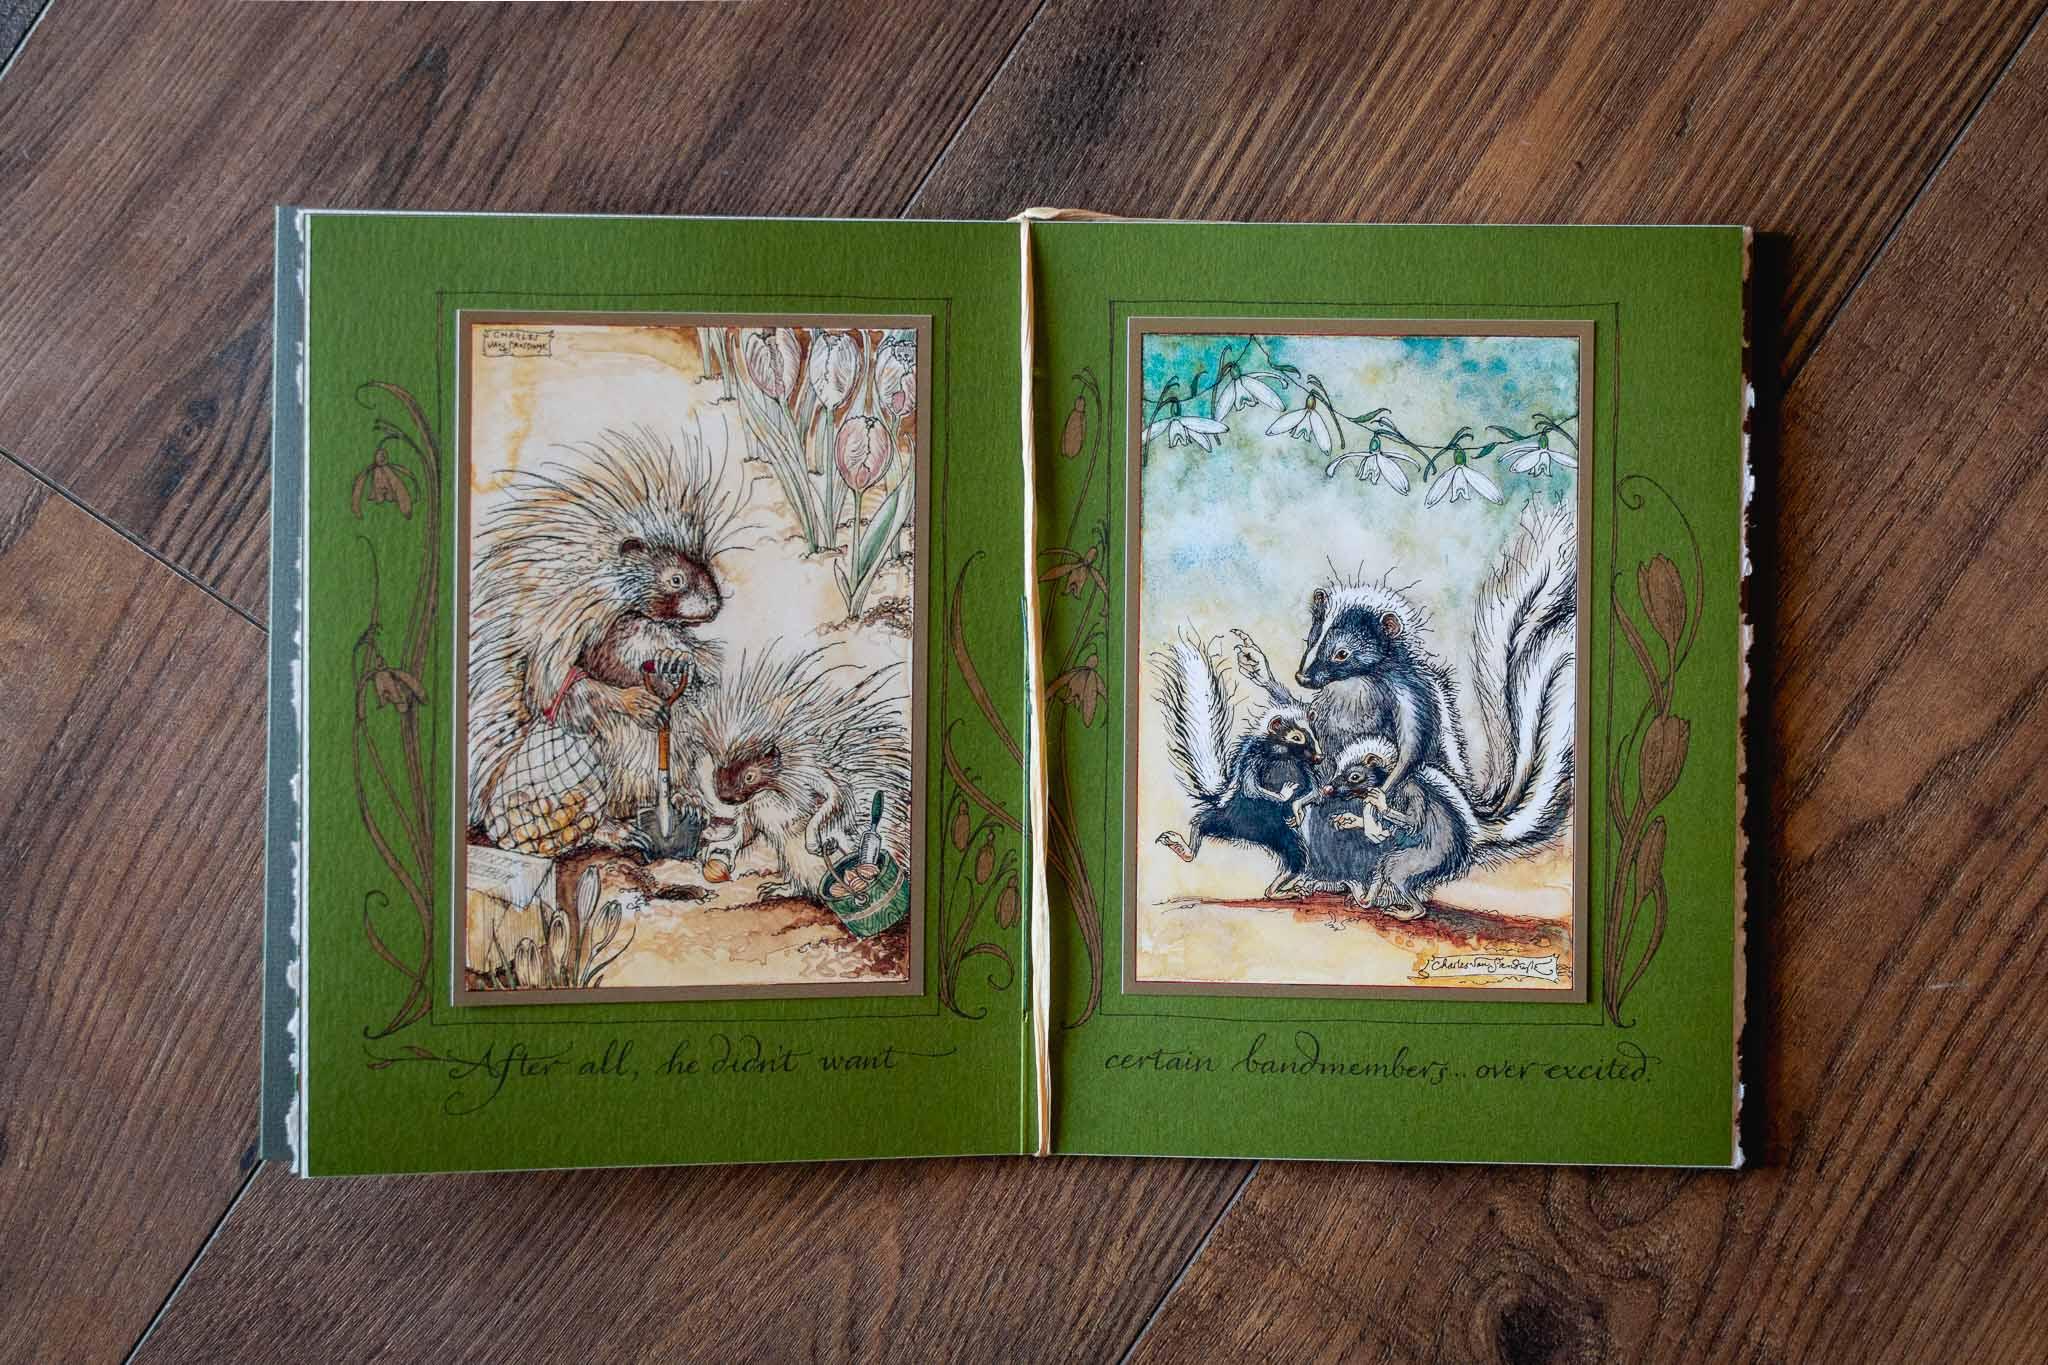 Mr. Rabbits Symphony Of Nature Fine Art Book by Charles Van Sandwyk